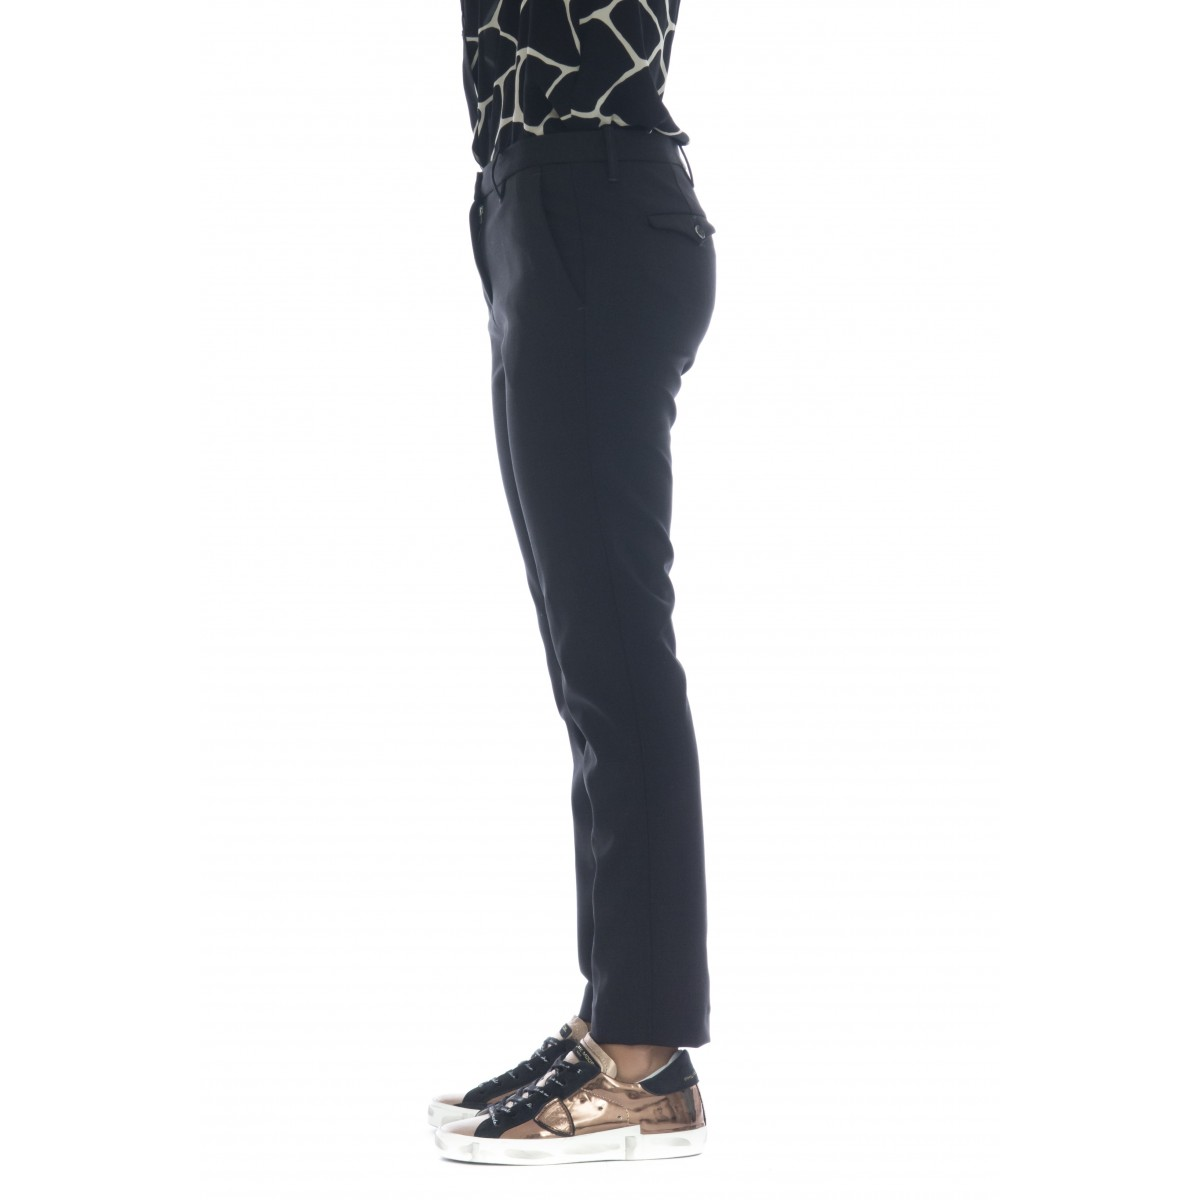 Pantalone donna - Reezy br64 tecnolana accopiata lycra